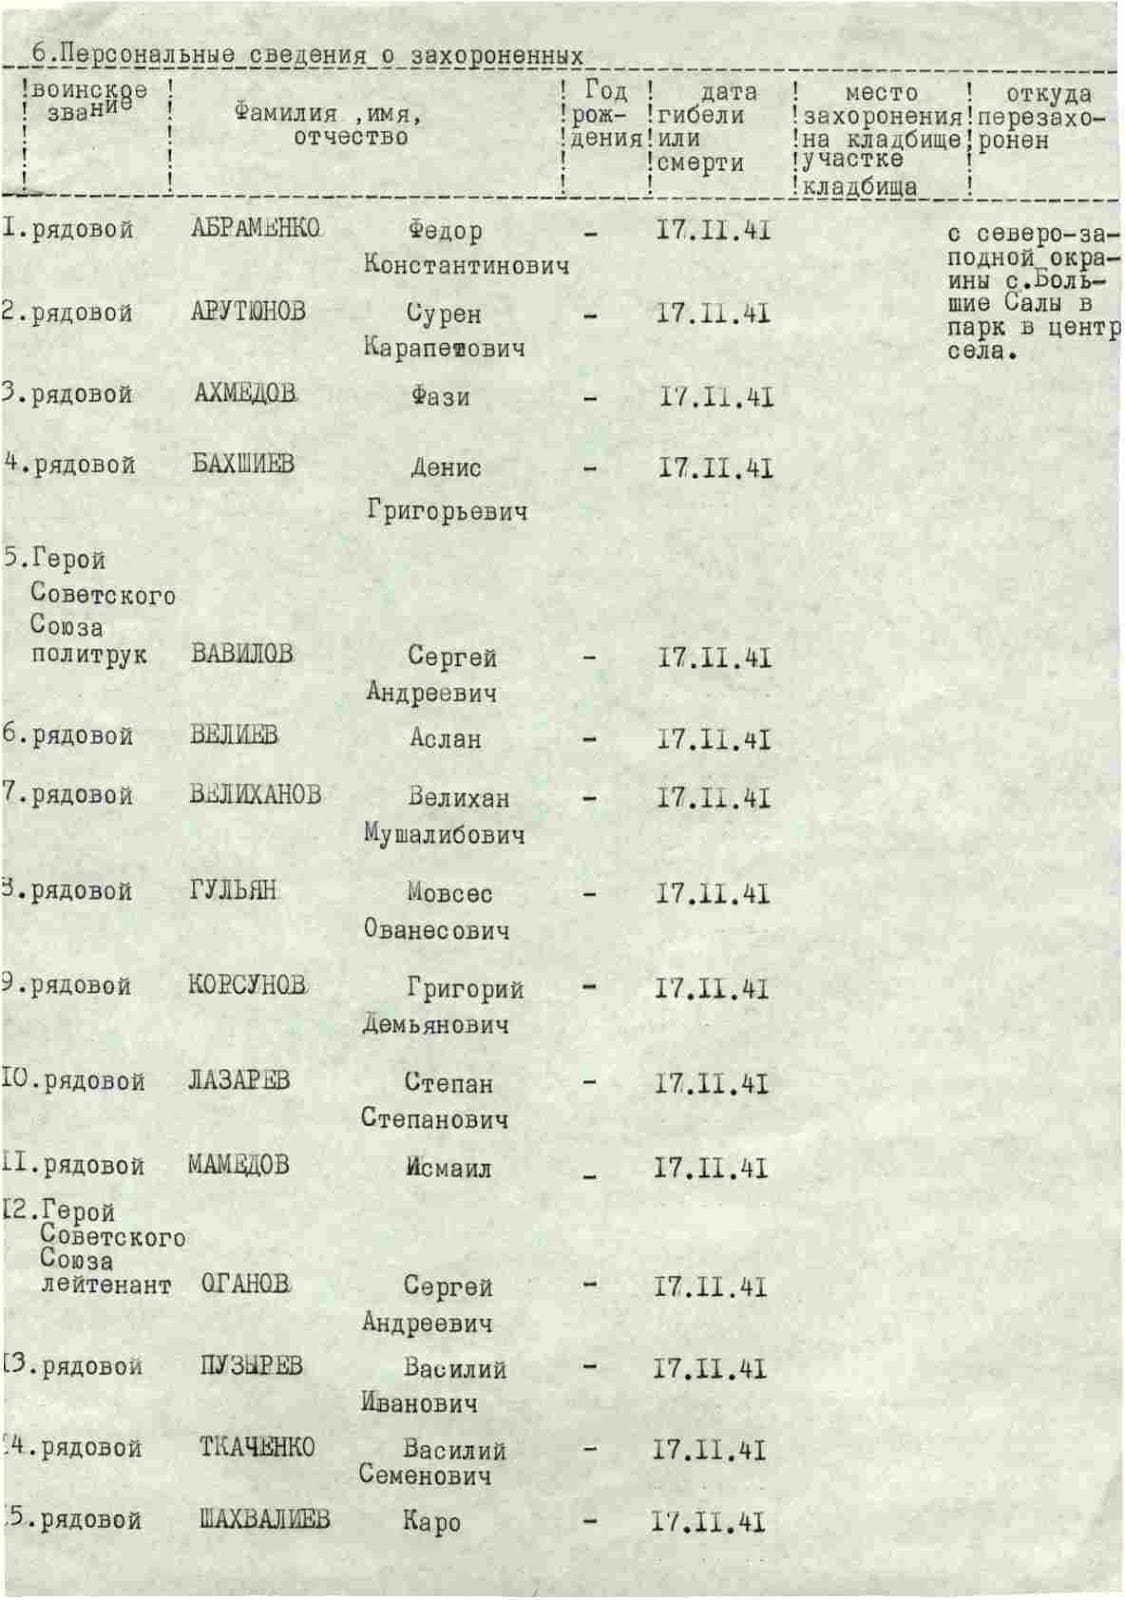 Список из архива с фамилиями артиллеристов